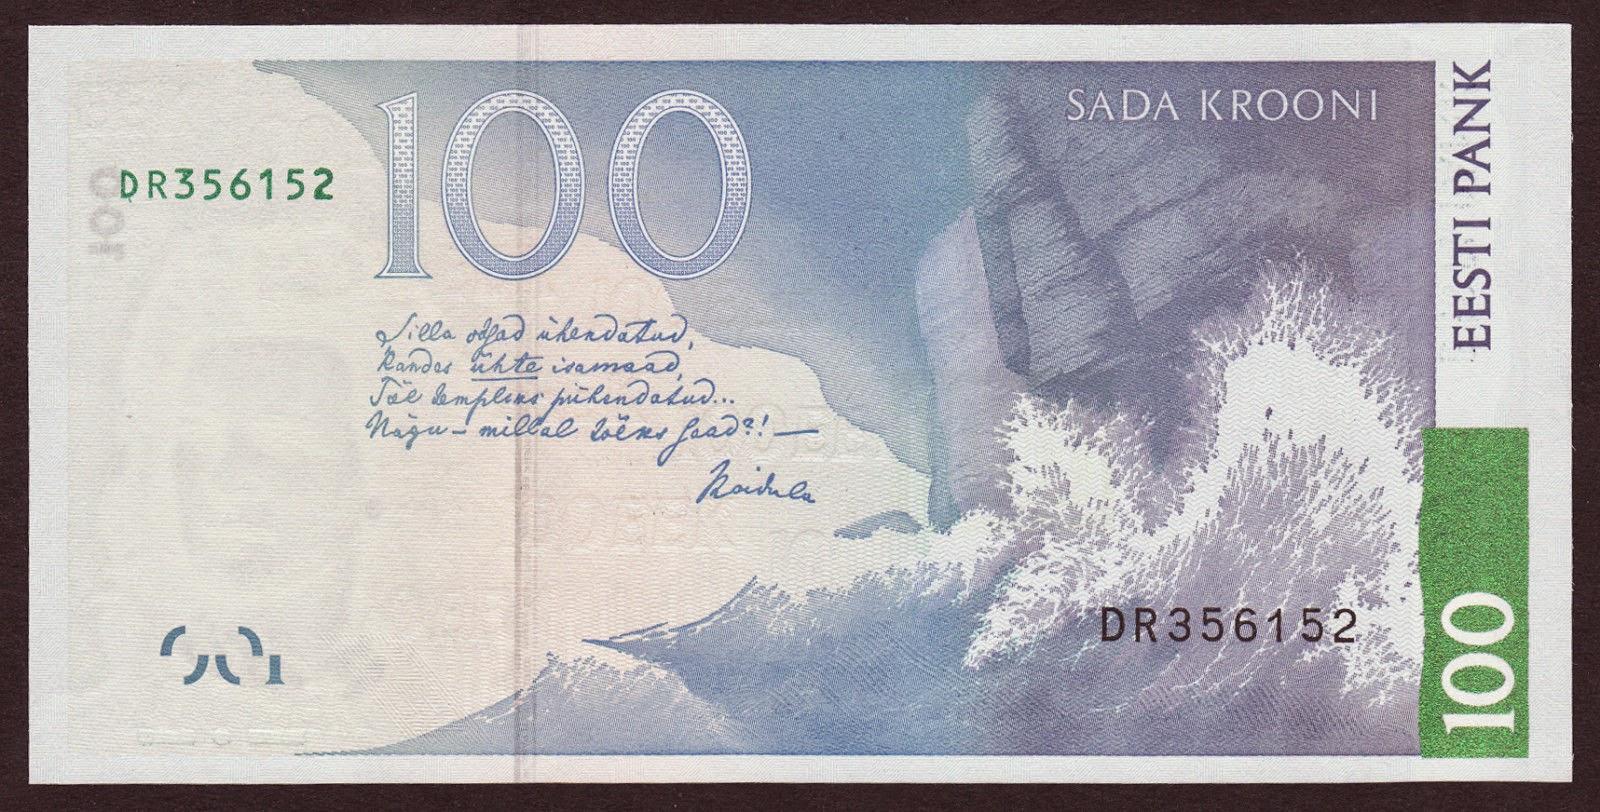 Estonia banknotes 100 krooni note